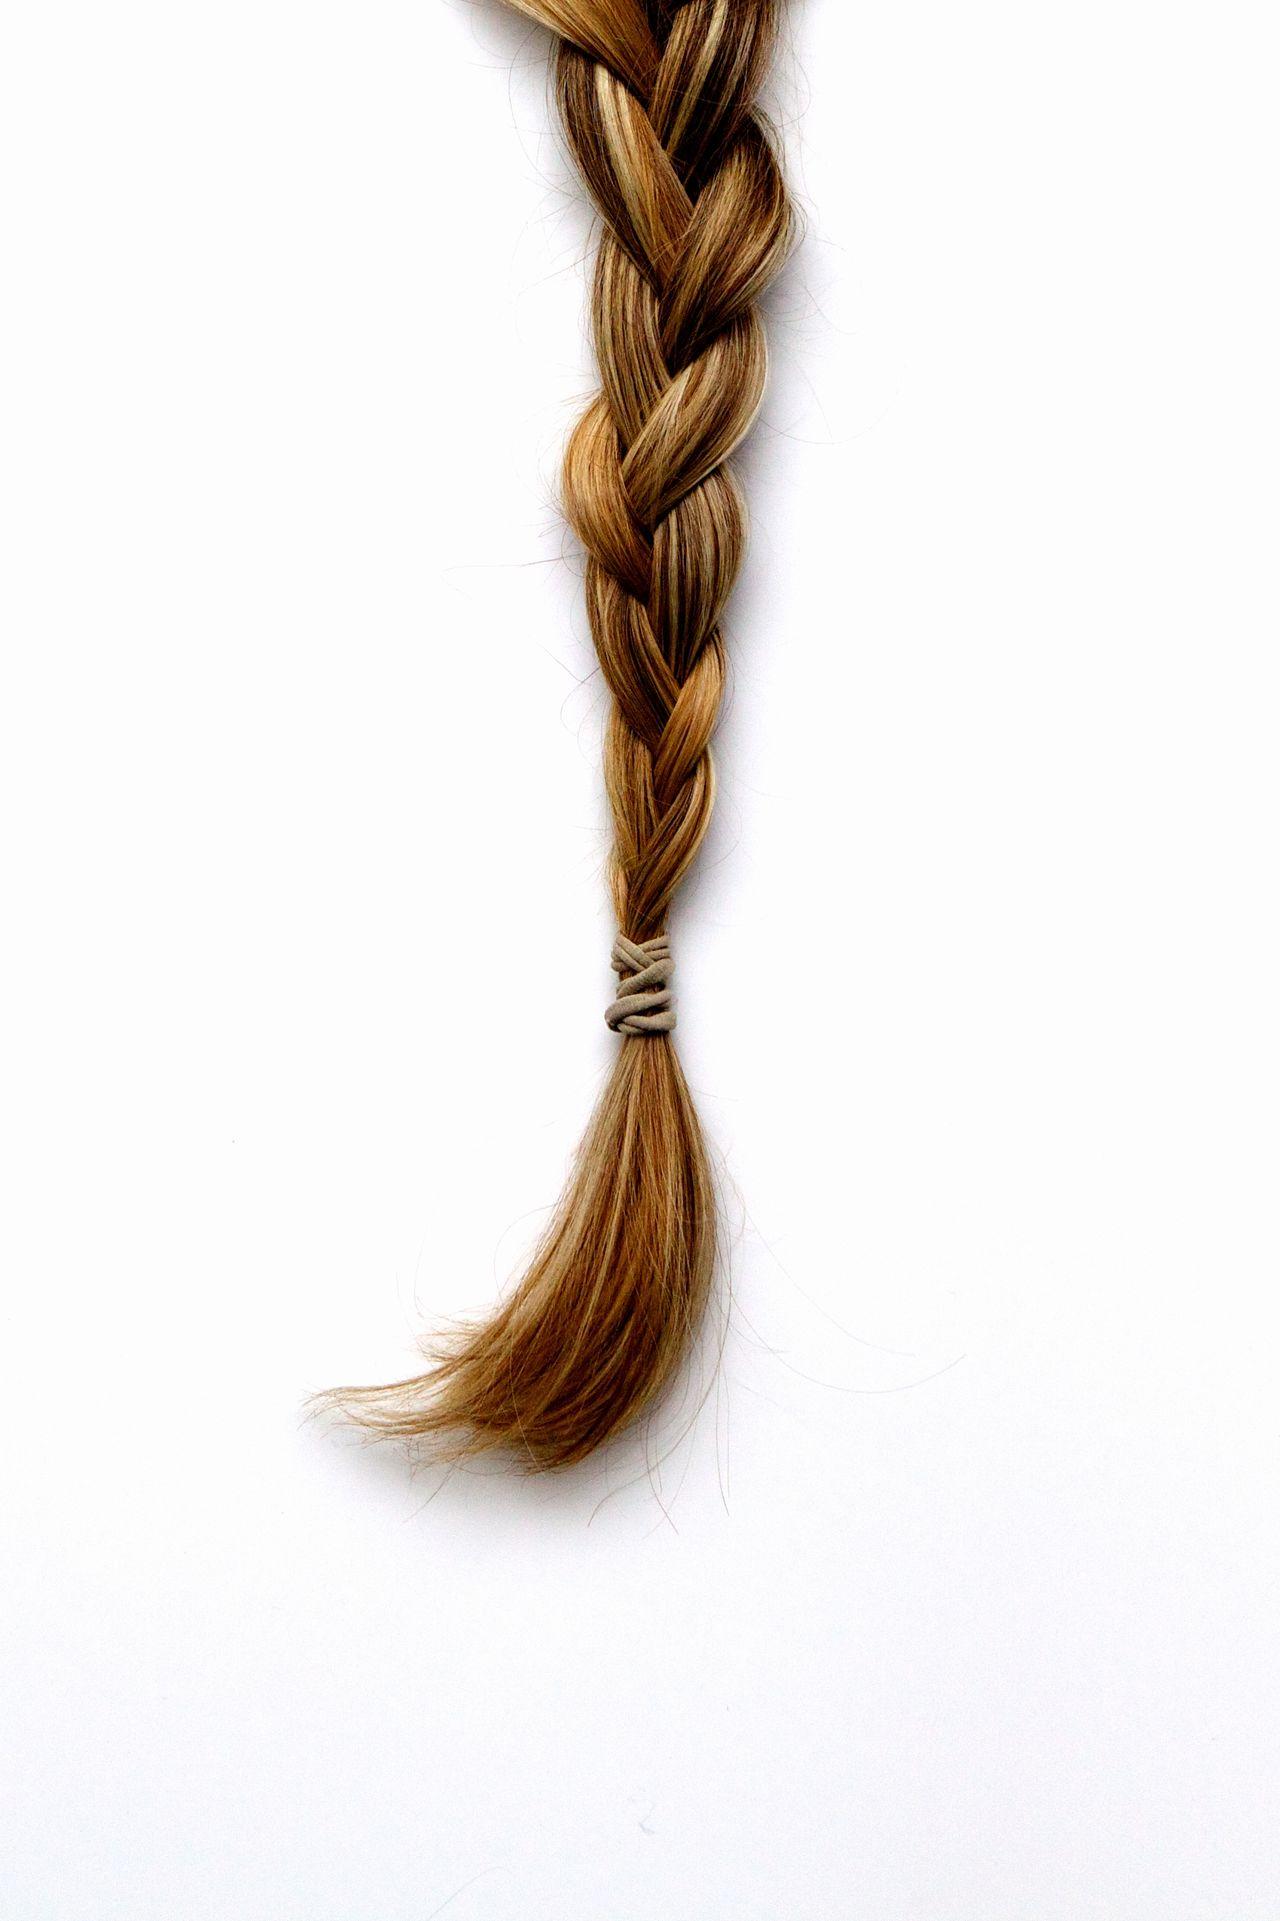 Blond braided hair against white background